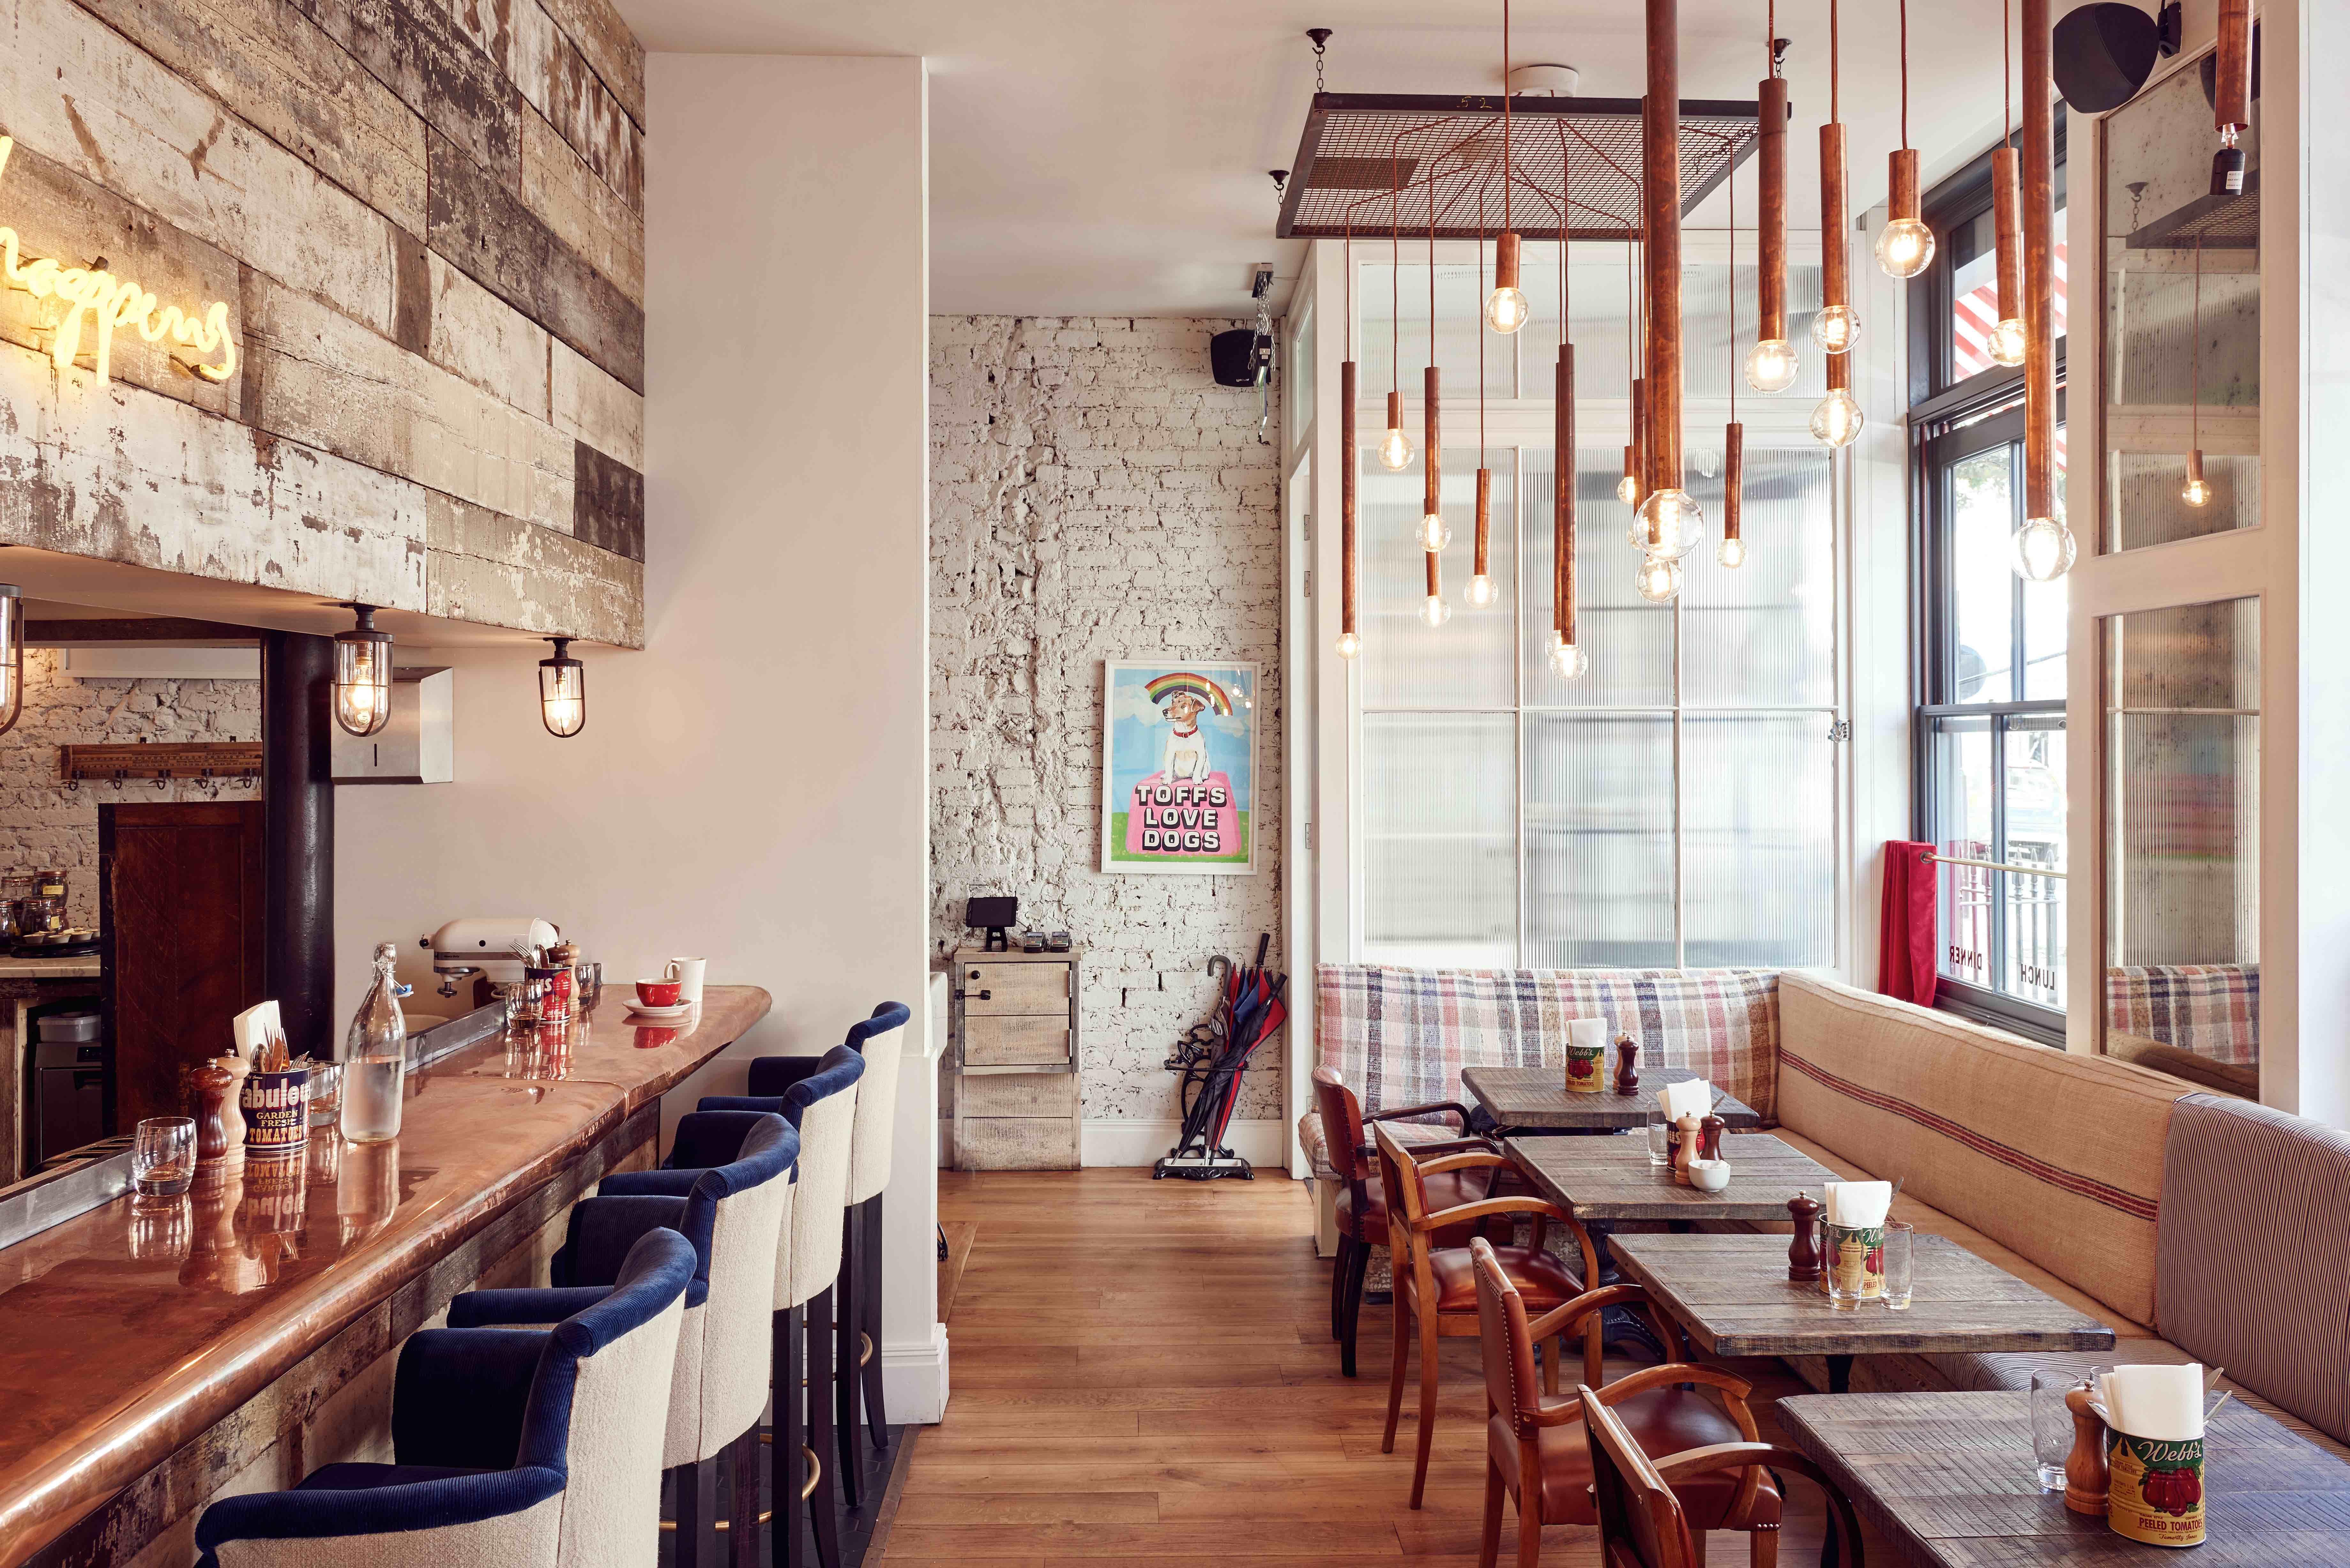 2015 restaurant bar design awards entry the cambridge street kitchen london uk restaurant or bar in a hotel - Rustic Hotel 2015